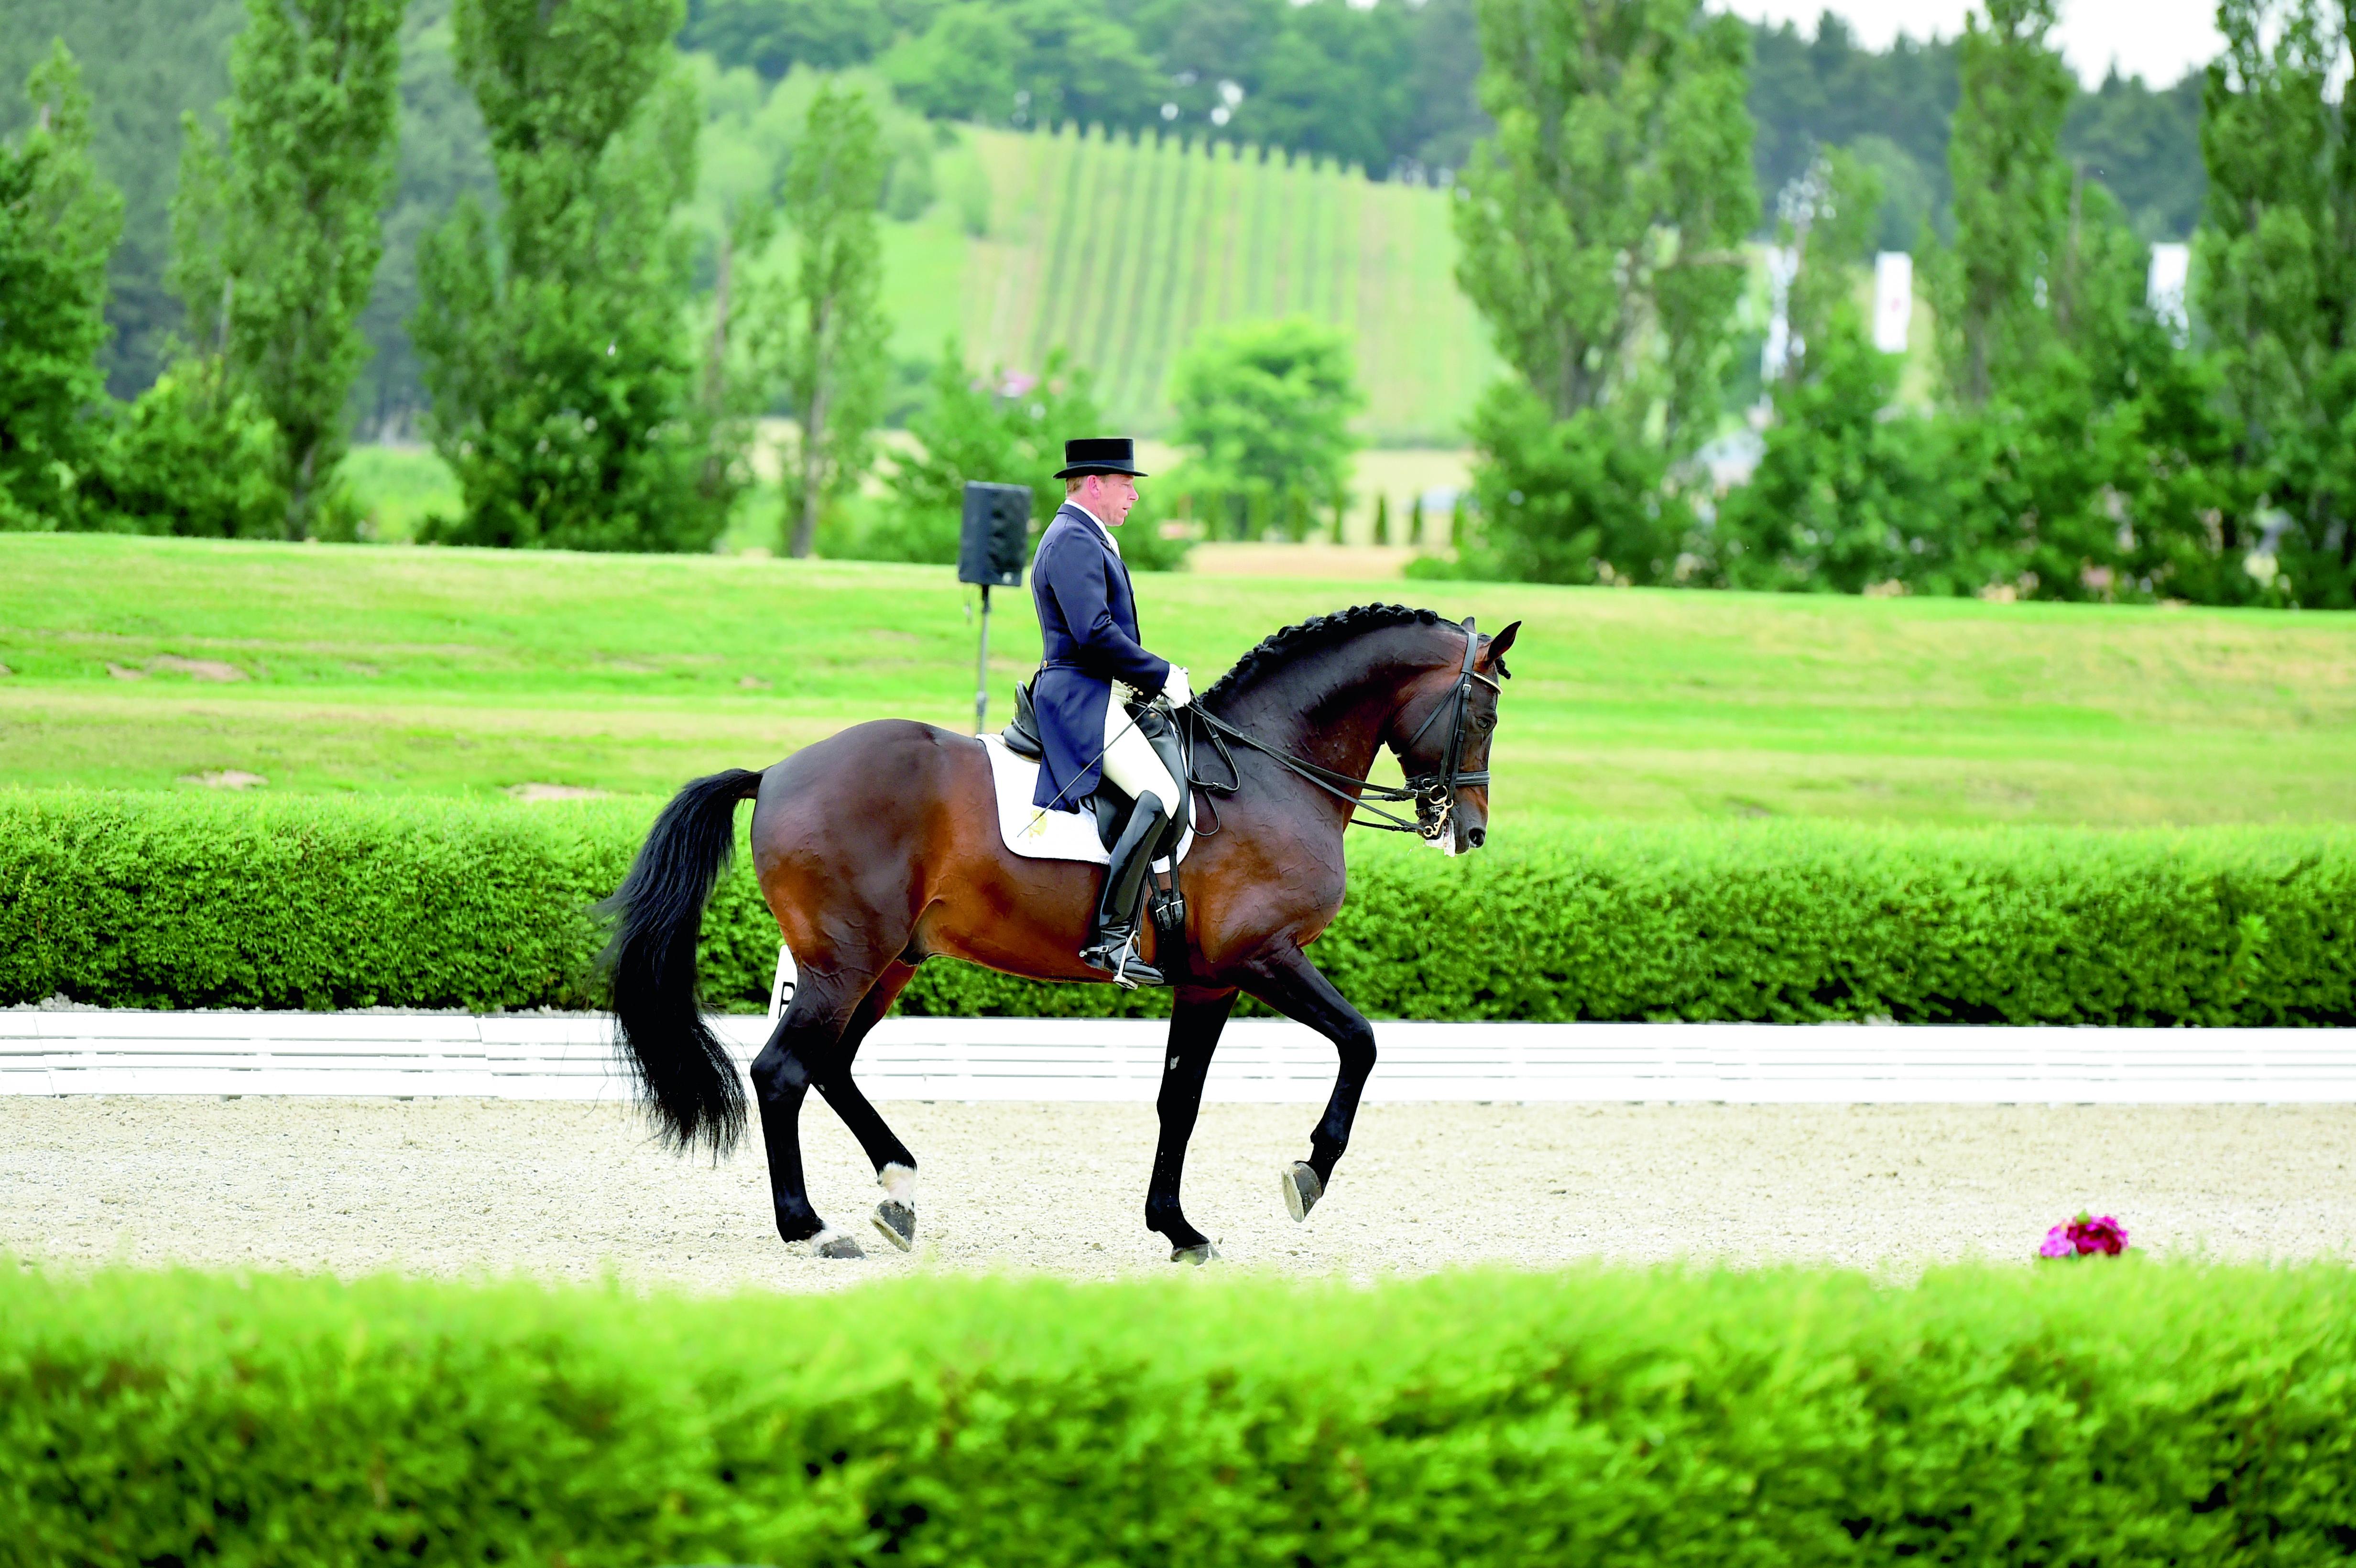 Sir Liberty v. Sir Landadel - Norman - Rheinprinz, hocherfolgreich bis hin zum Grand Prix unter Falk Rosenbauer